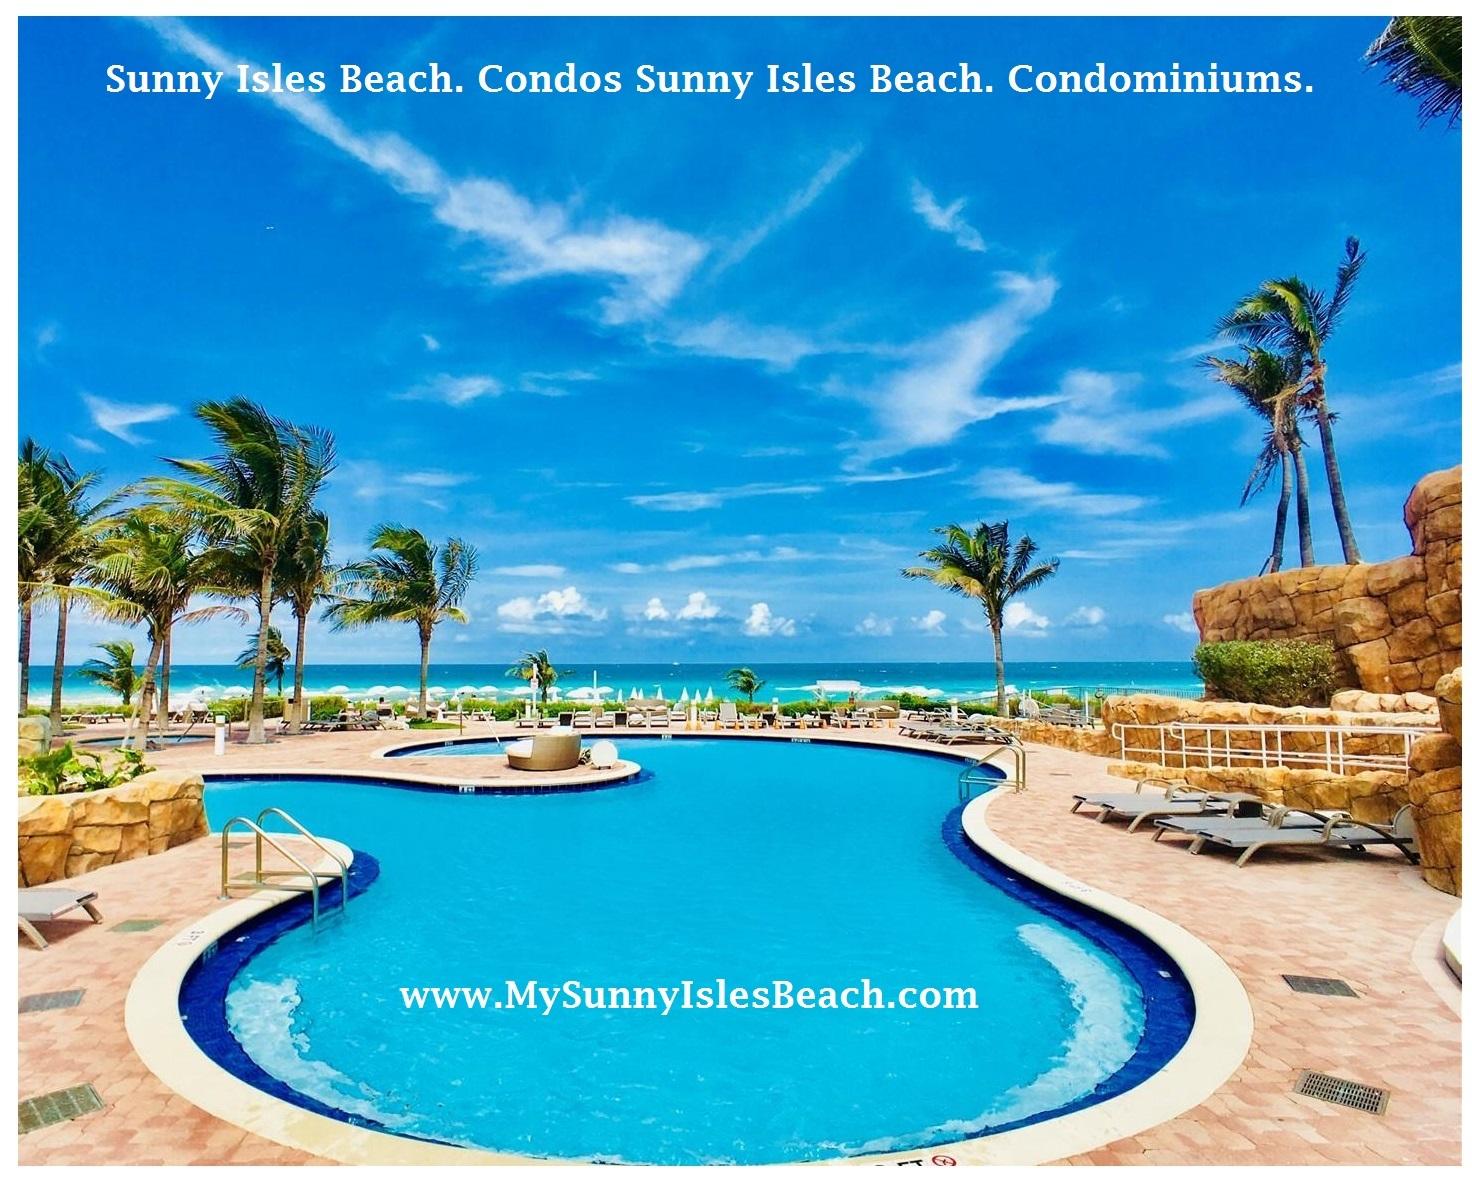 Sunny Isles Beach. Condos Sunny Isles Beach. Condominiums. Condo For Sale Sunny Isles Beach. Oceanfront Condos Sunny Isles Beach.